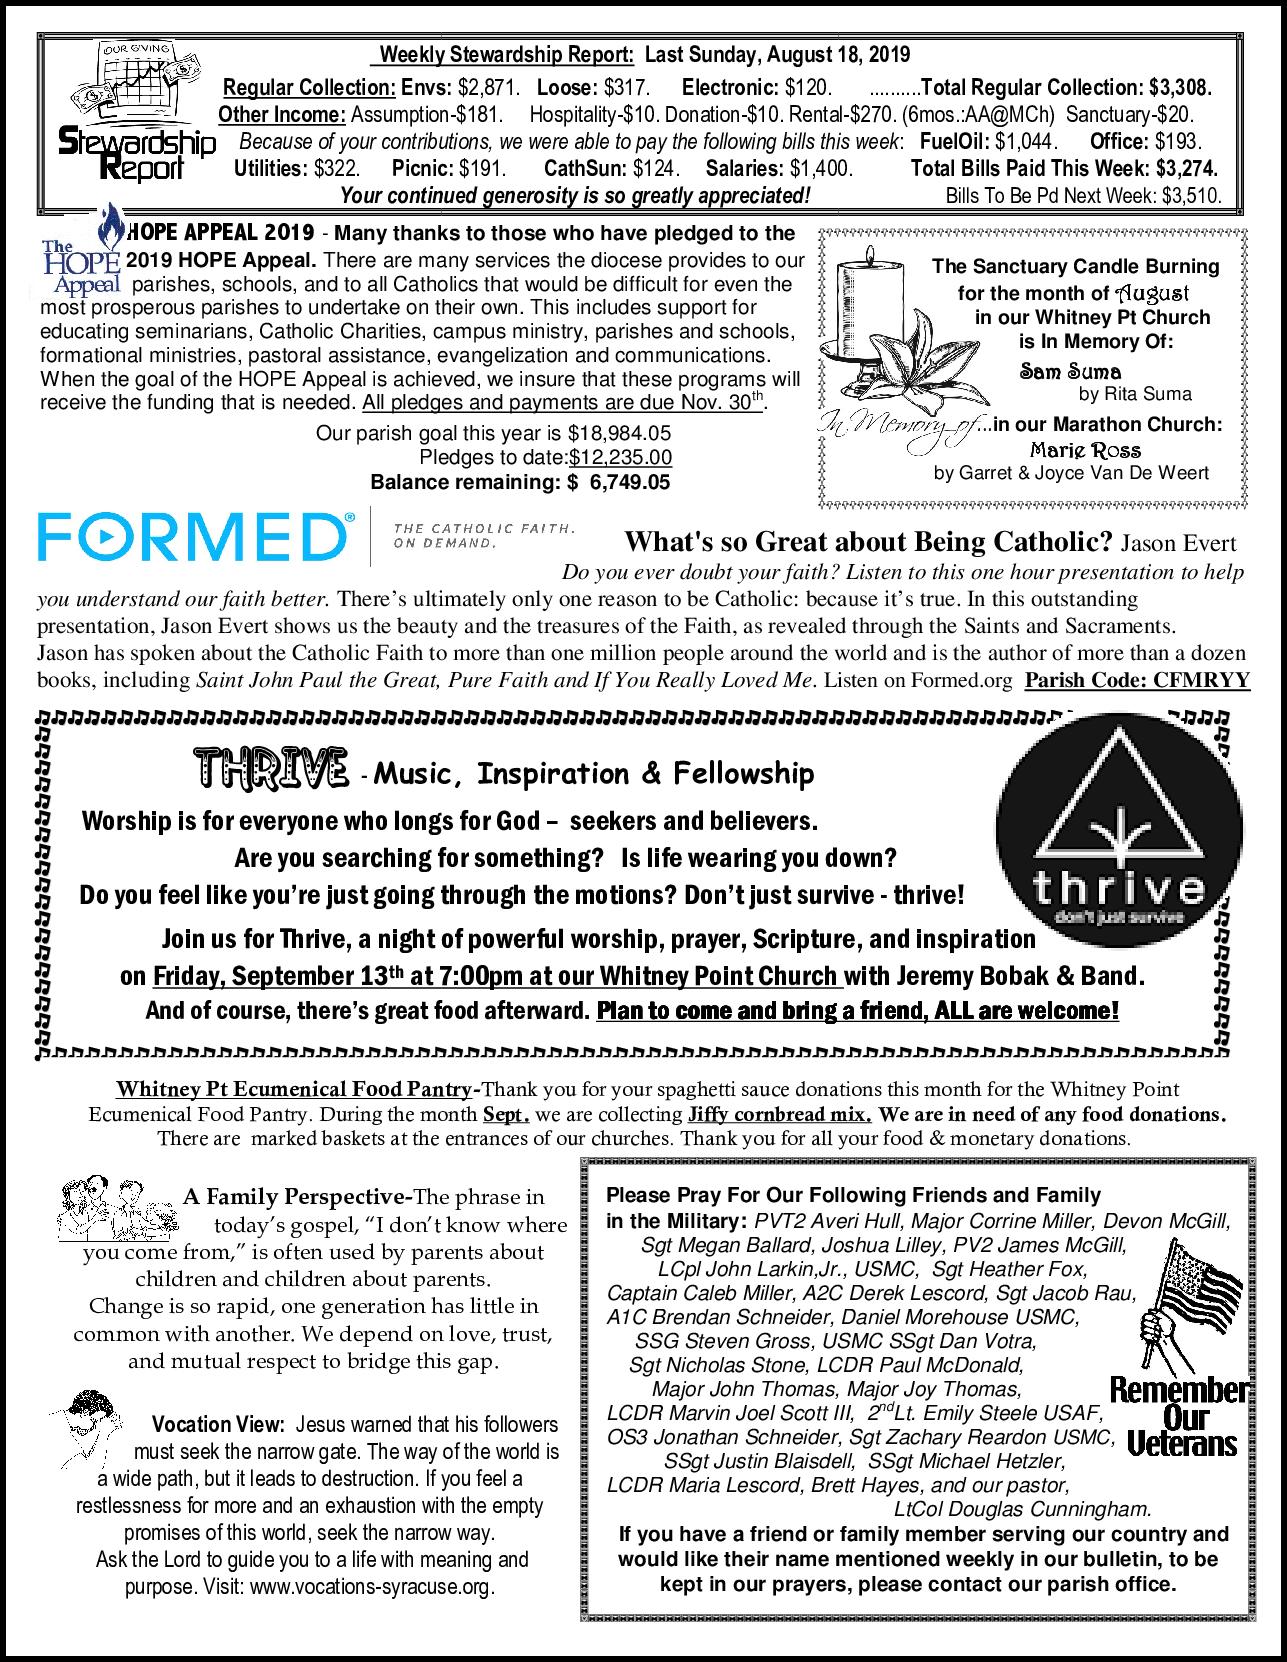 CCSSSP Church Bulletin – August 25, 2019 – Catholic